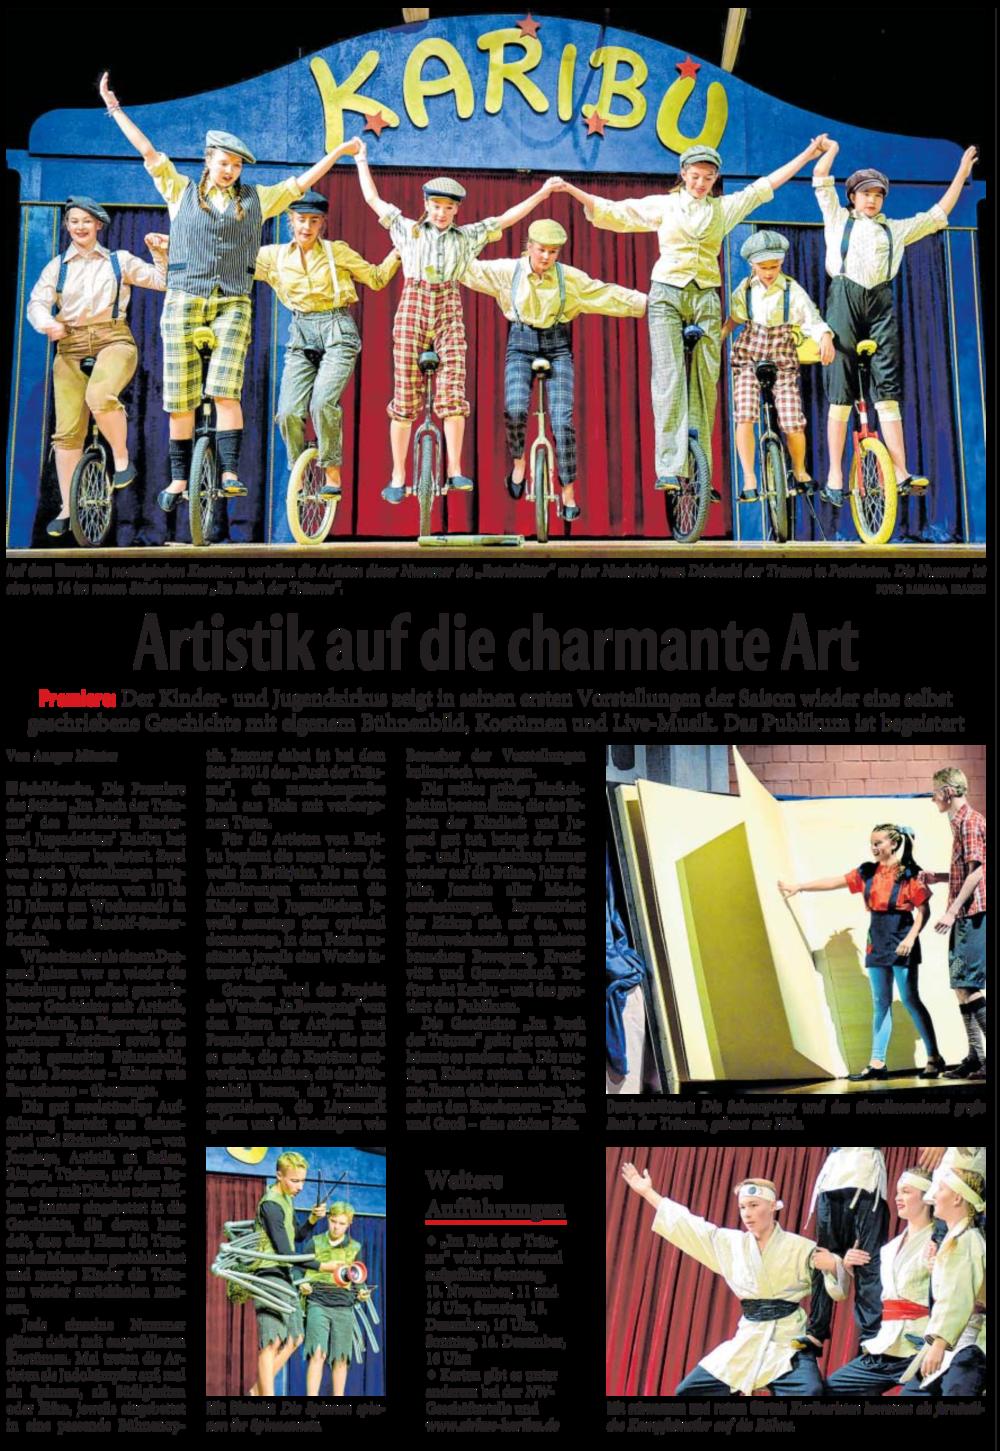 zirkus karibu premiere im land der träume bielefeld.png